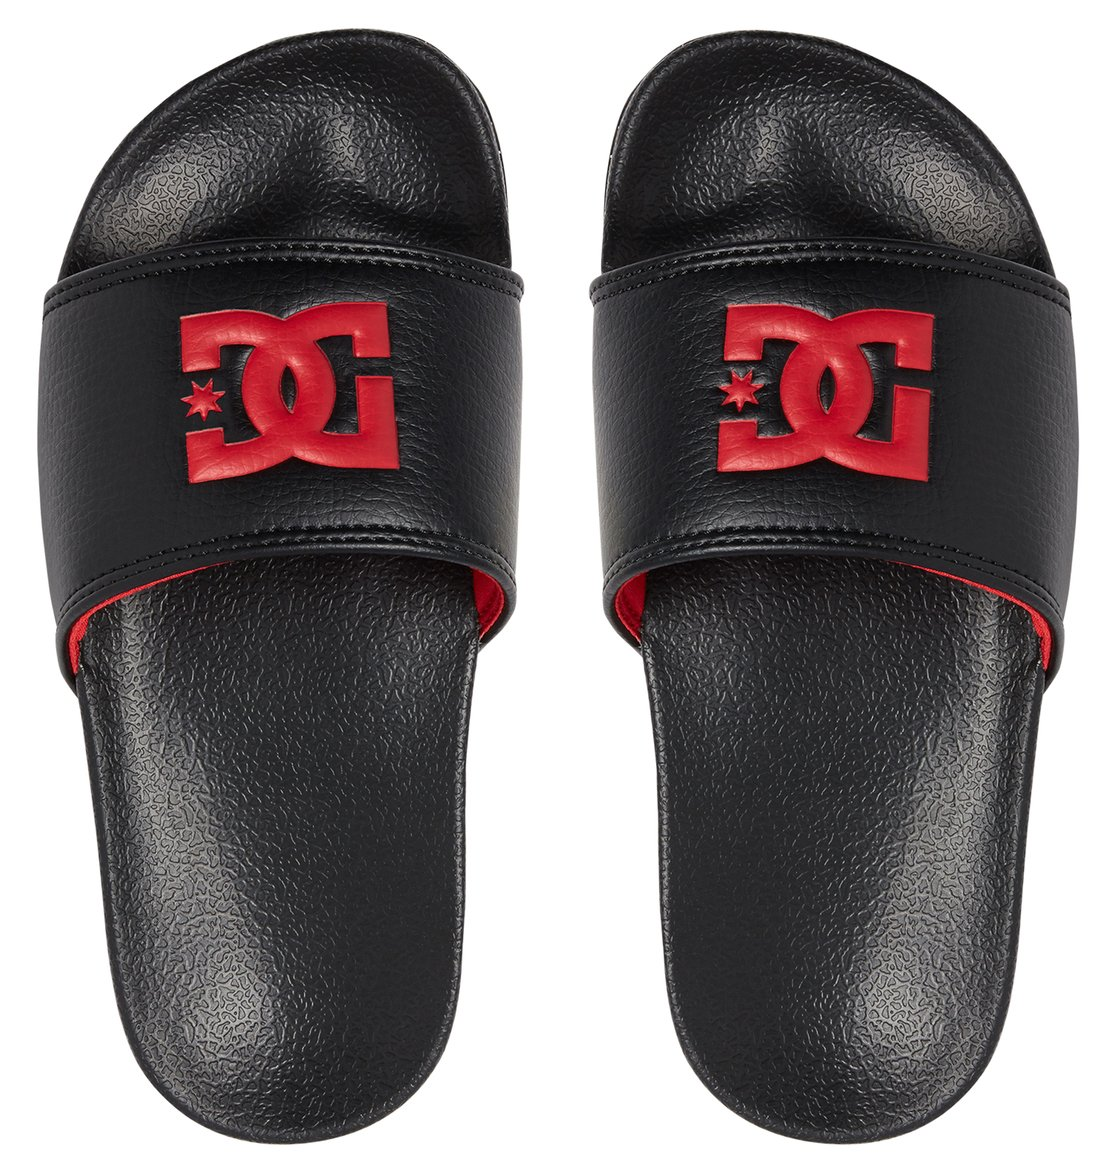 7d0f1a292b41f 2 Boy s 8-16 DC Slide Sliders Black ADBL100025 DC Shoes